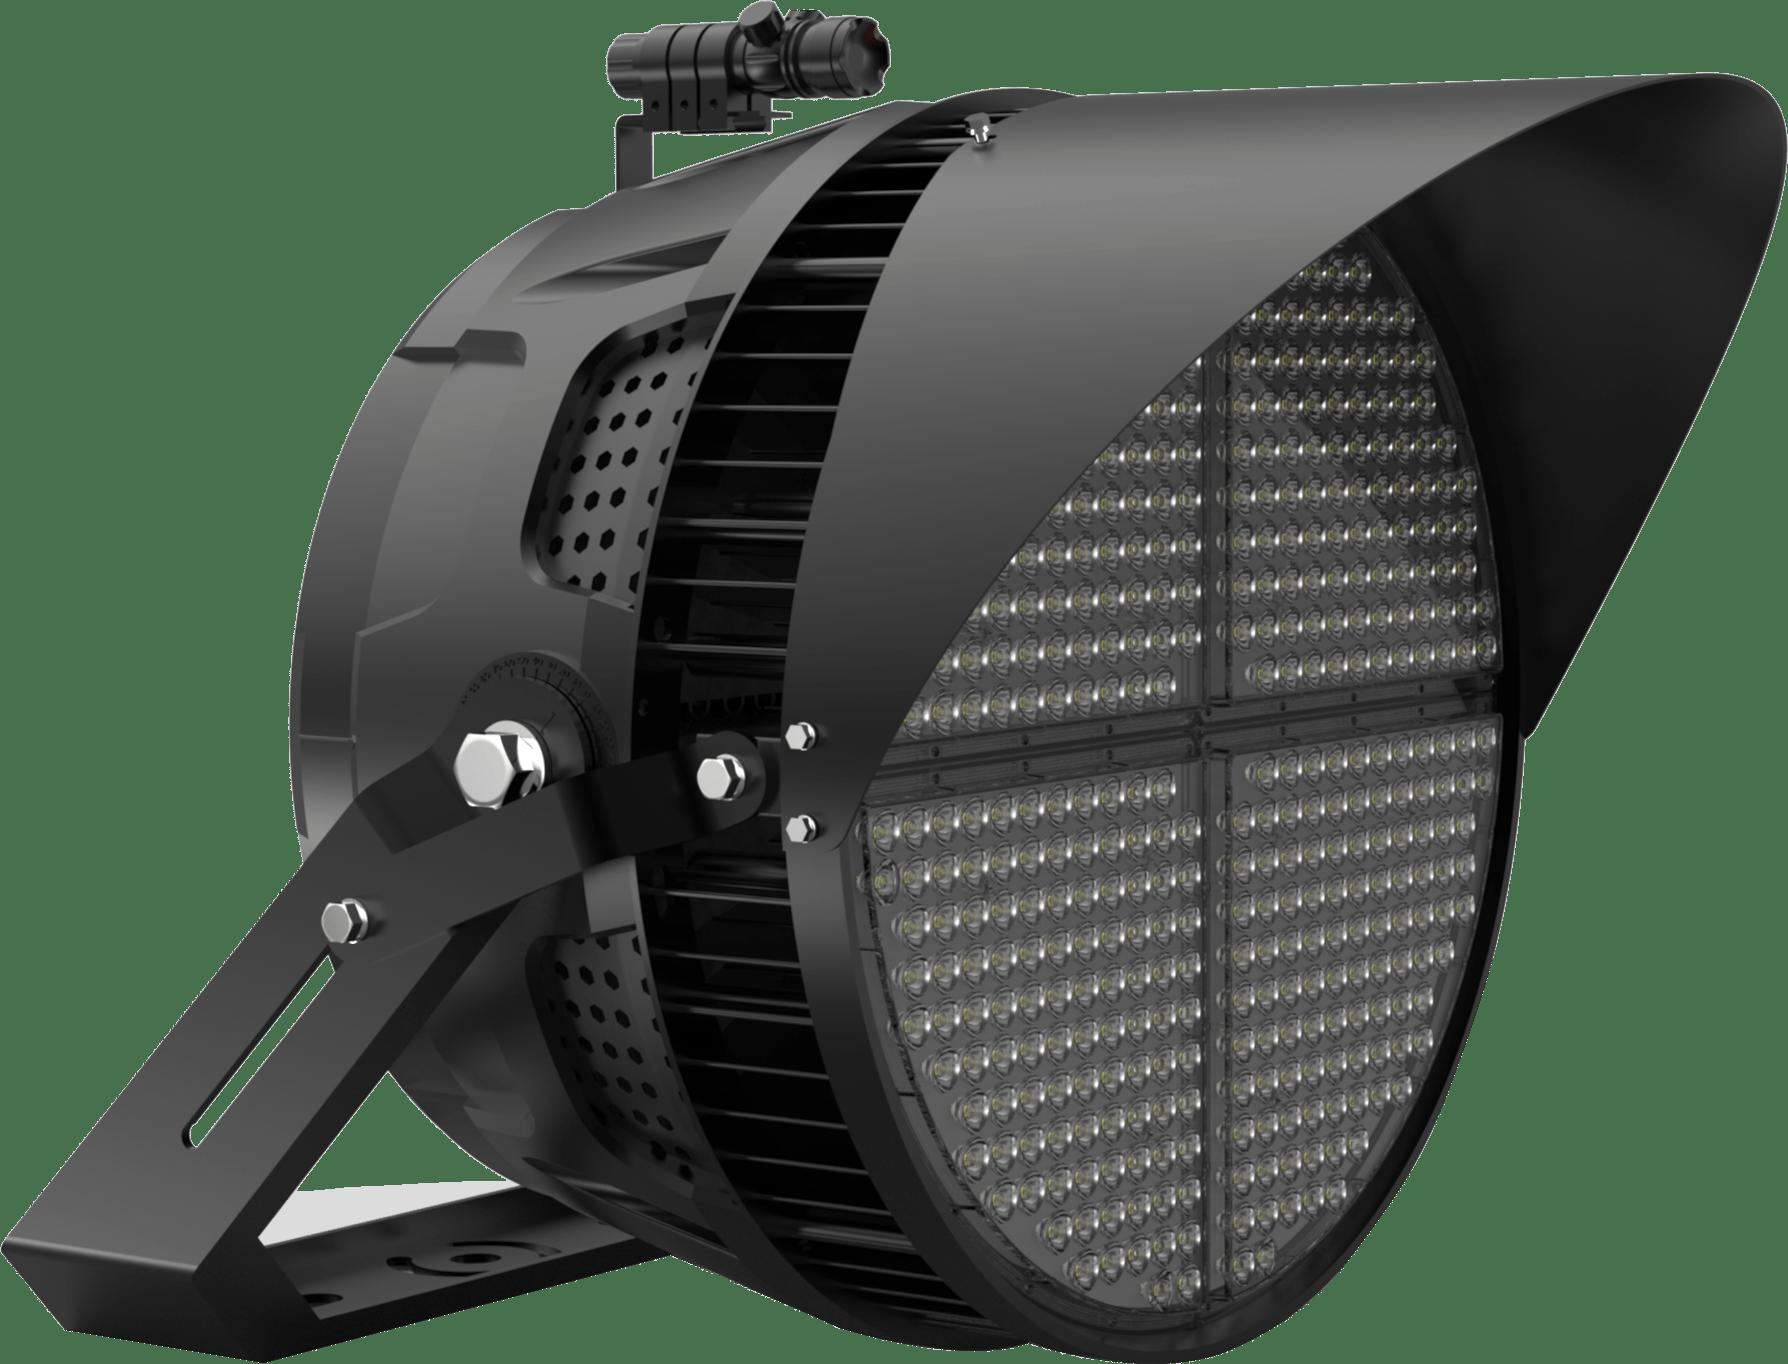 Triton G2 with laser